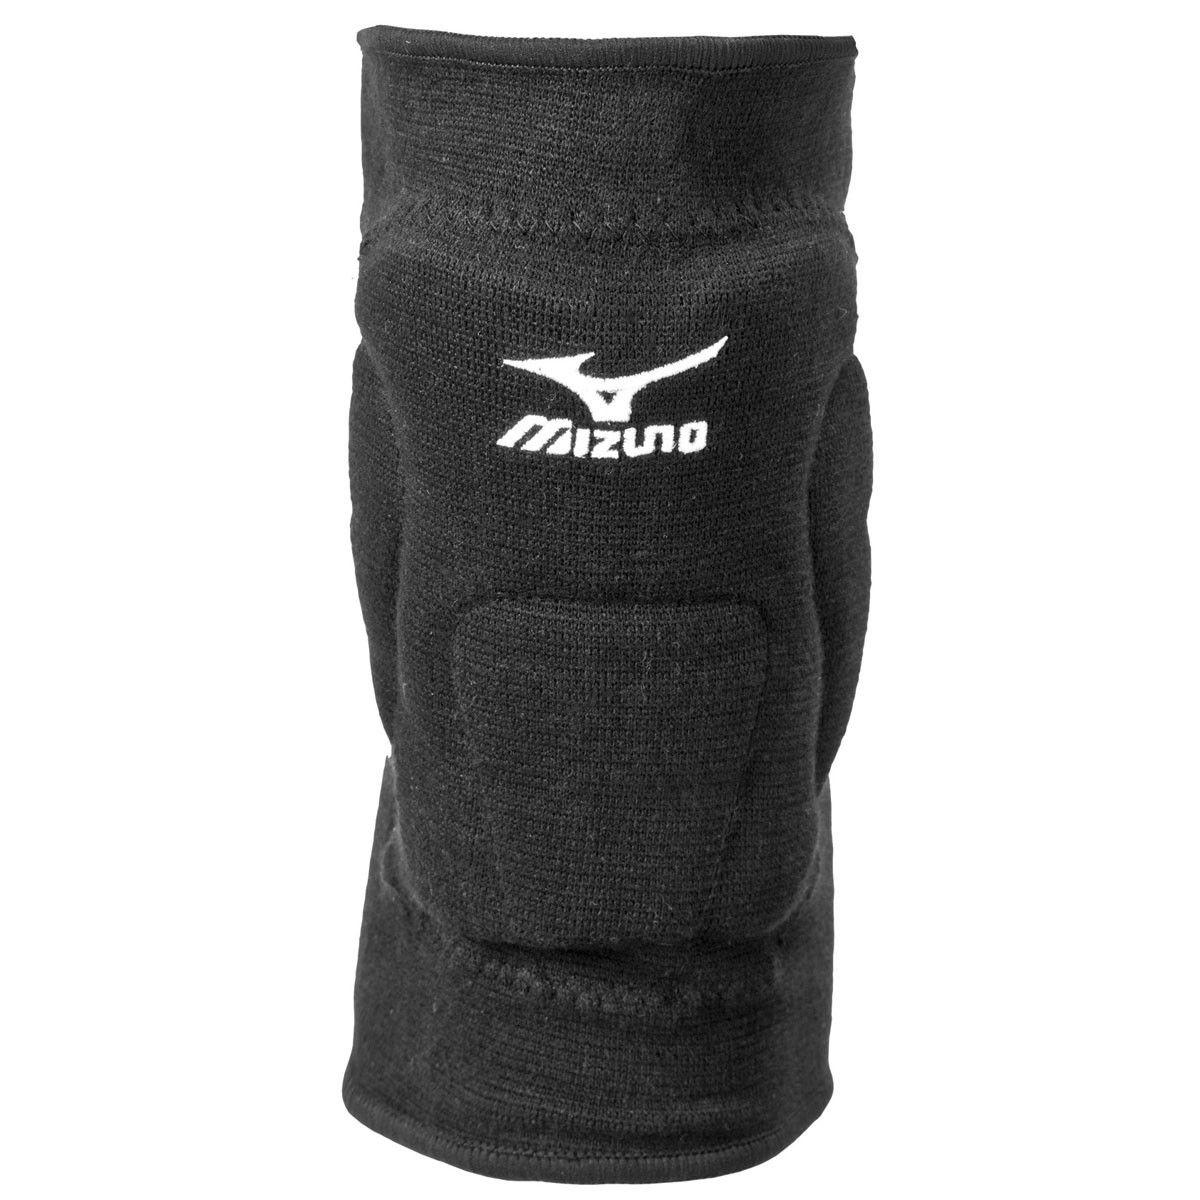 Mizuno Vs 1 Knee Pads Black Volleyball Knee Pads Mizuno Knee Pads